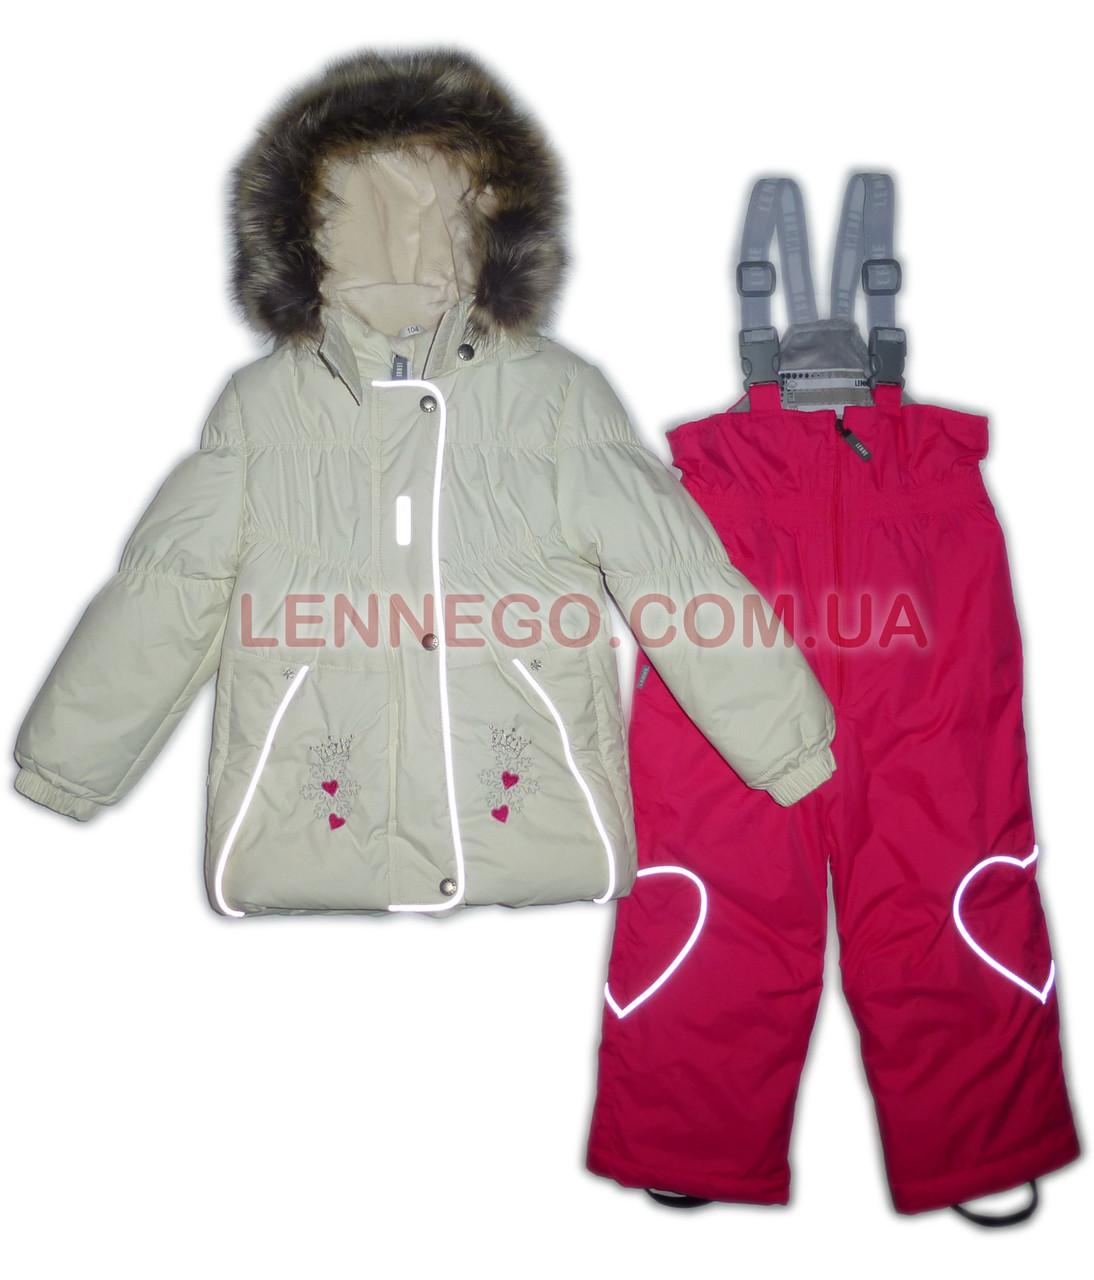 Куртка+полукомбинизон lenne 116р.